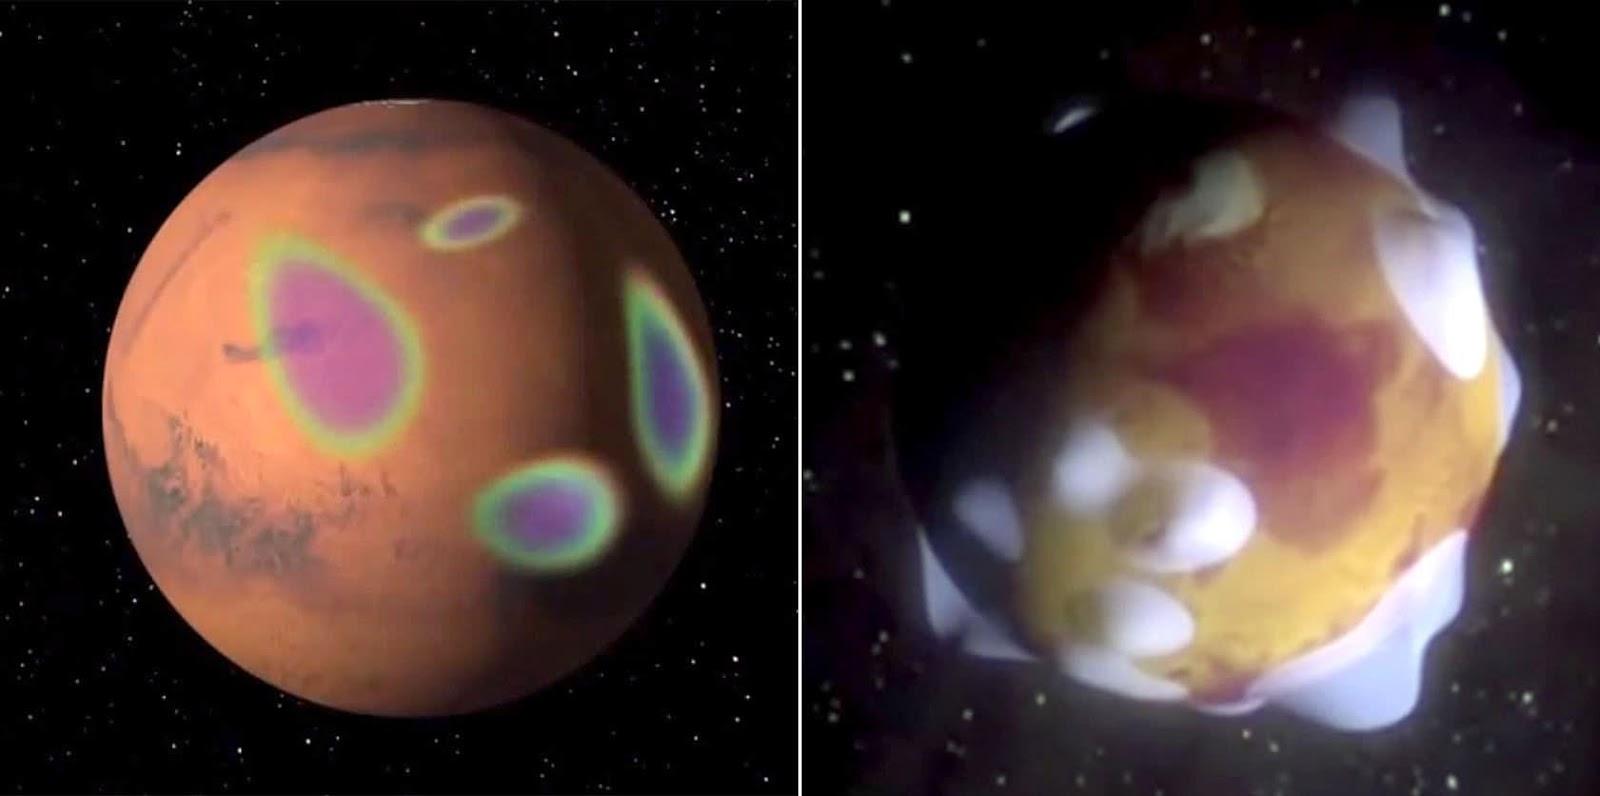 C:\Users\Пользователь\Desktop\Mars-aurora-panel-NASA.jpg